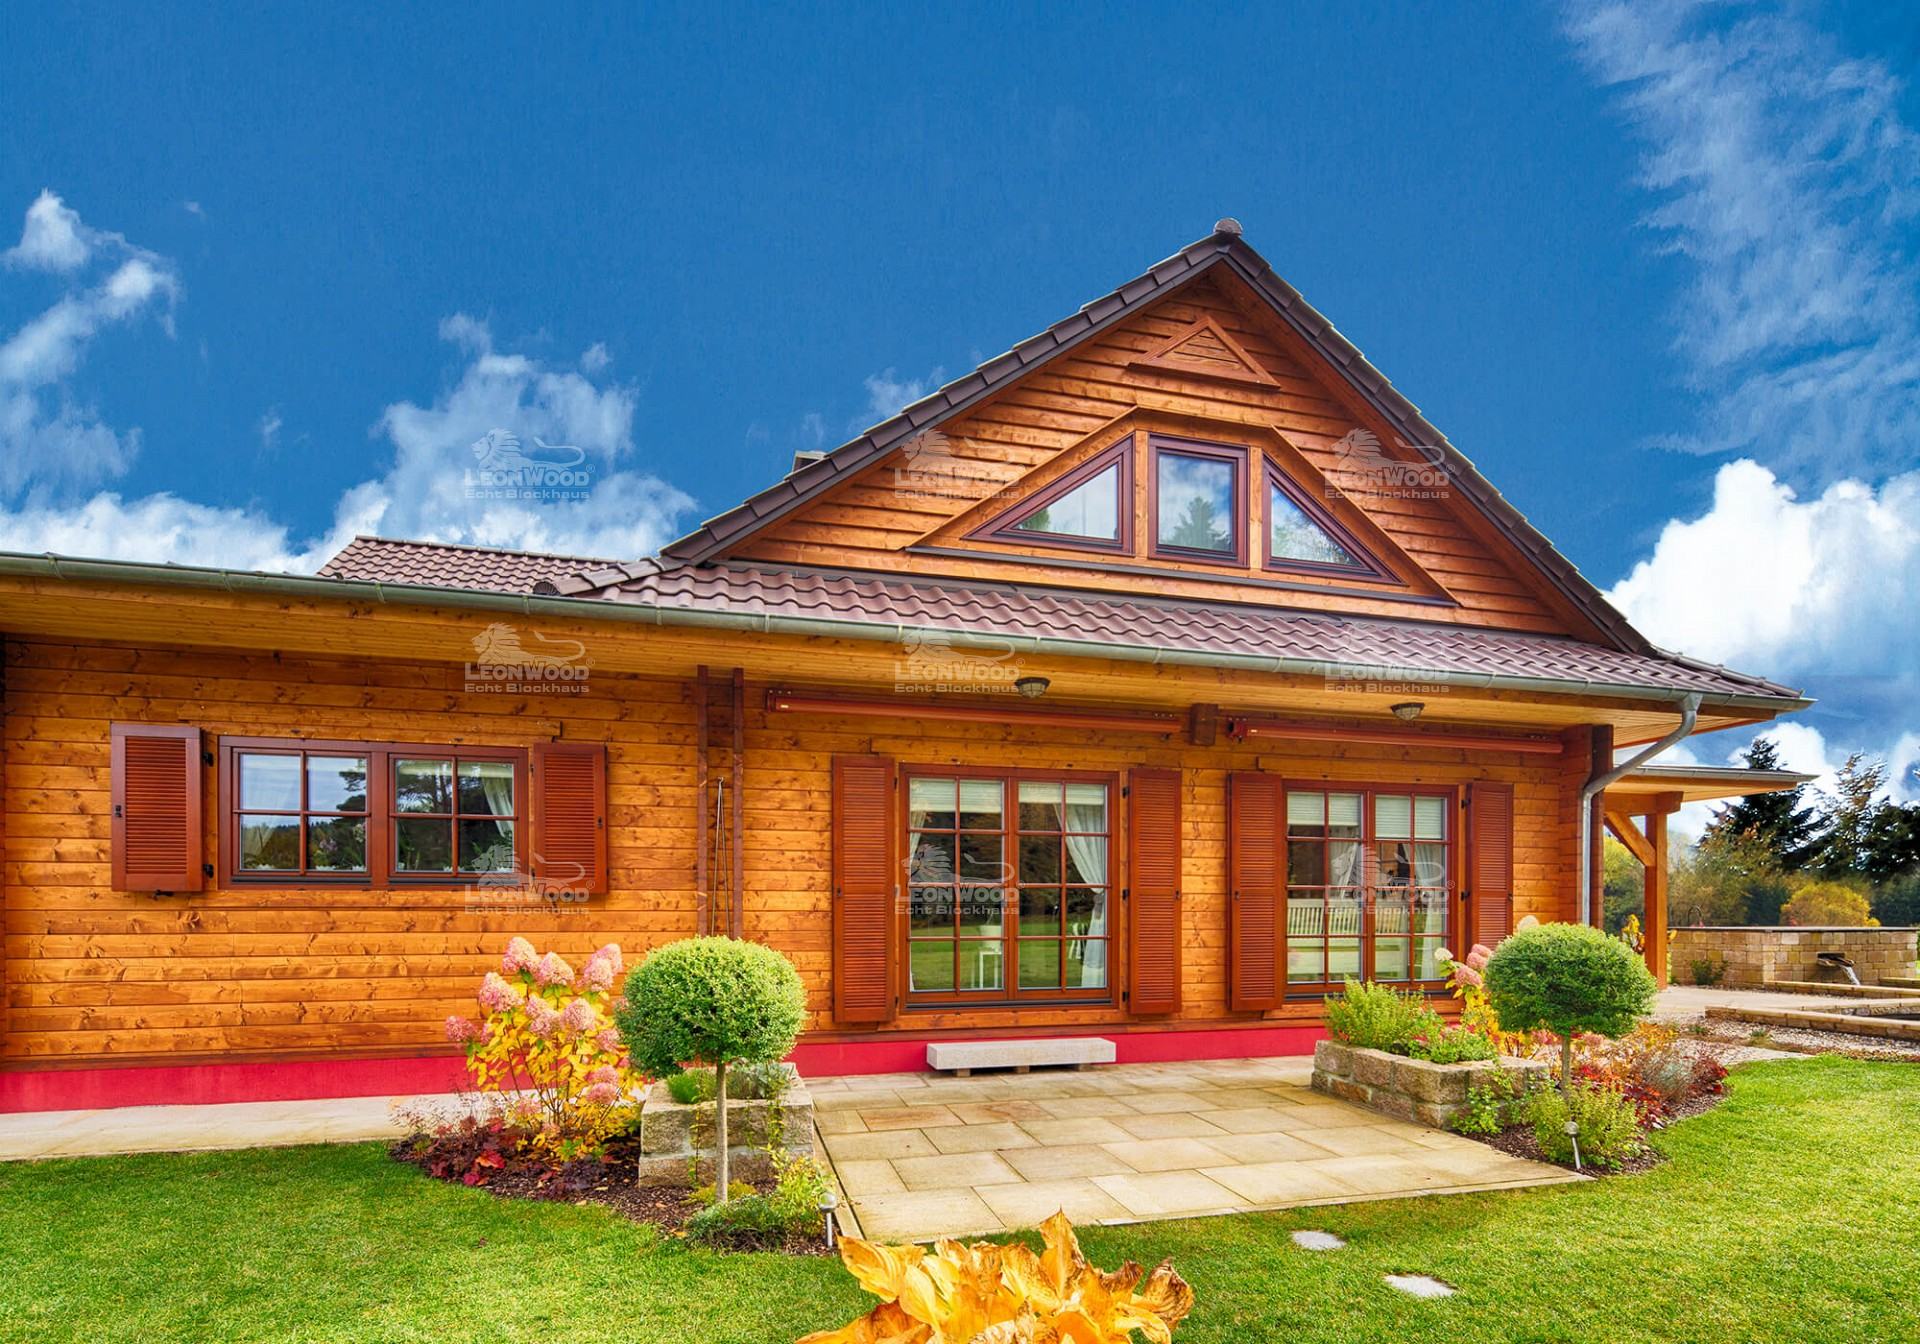 blockhaus canada nordamerikanischer lifestyle mit l onwood. Black Bedroom Furniture Sets. Home Design Ideas